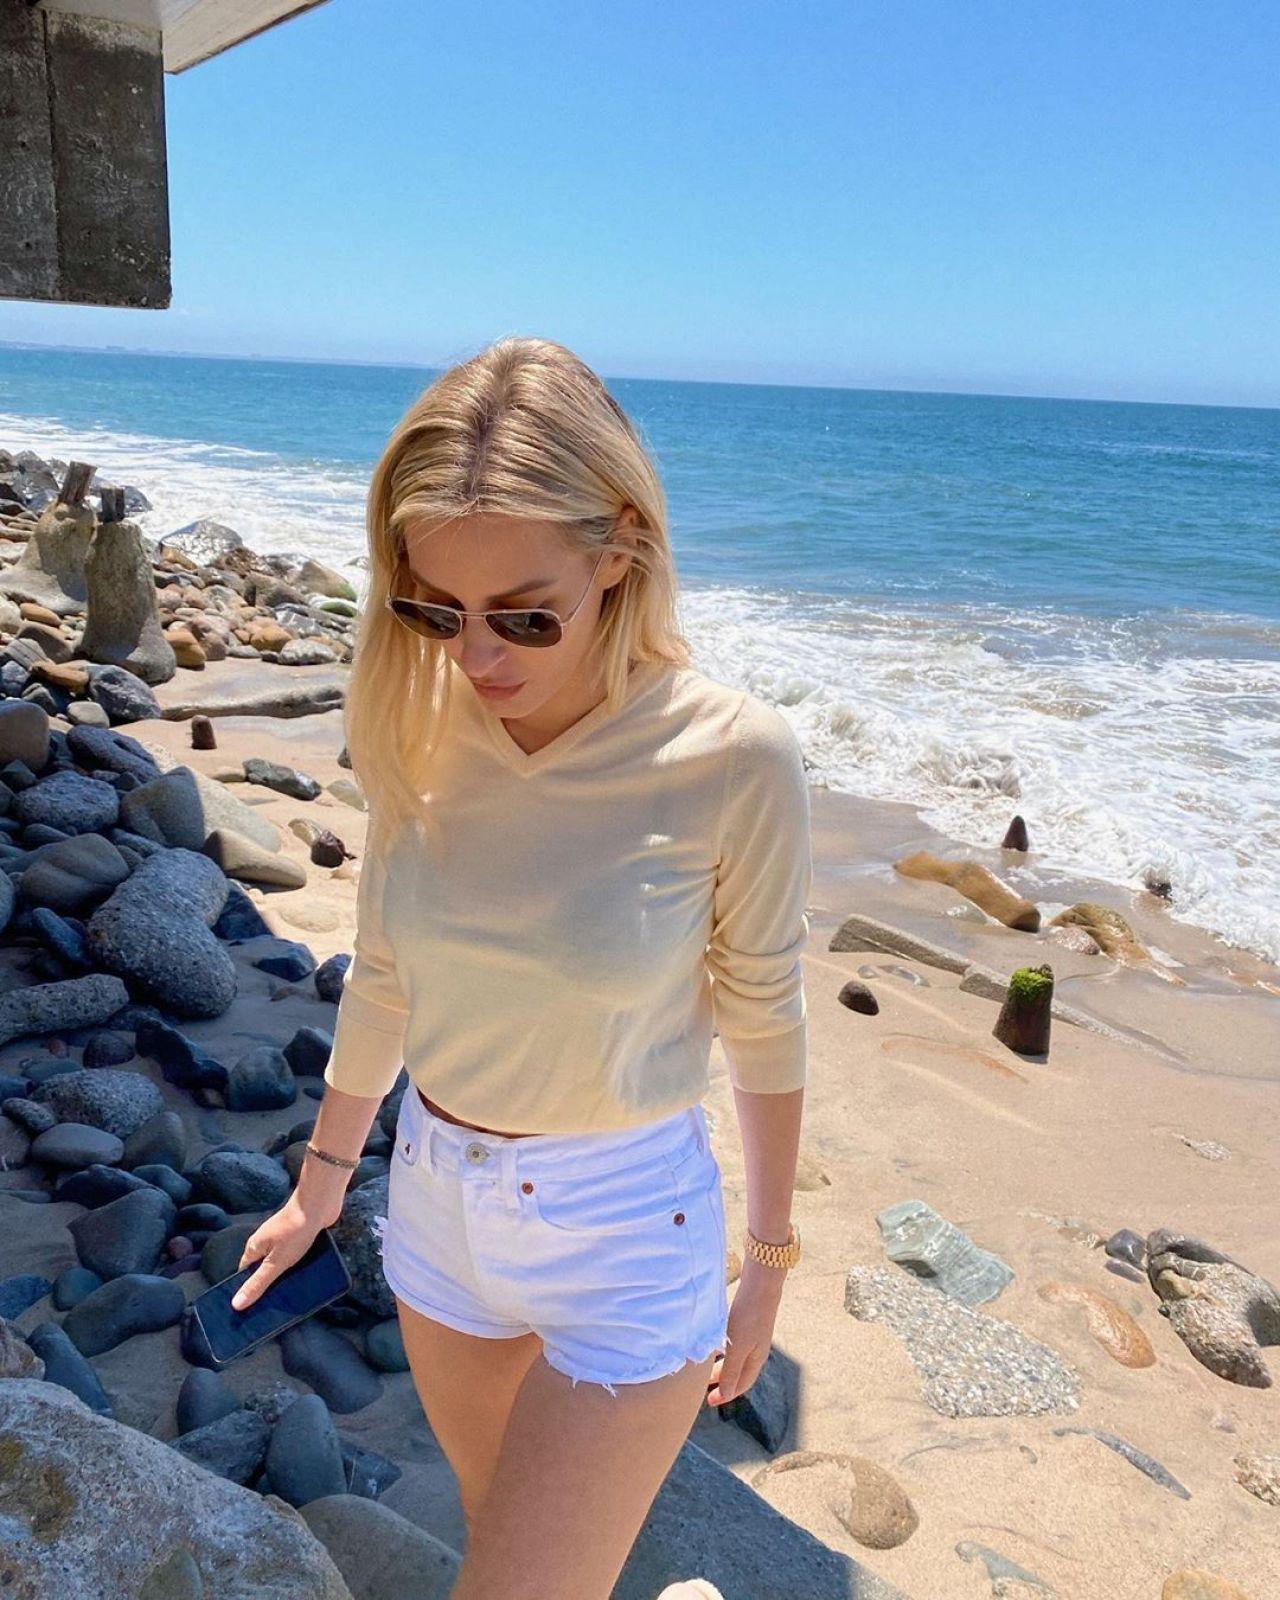 Morgan Stewart Instagram and Socials details